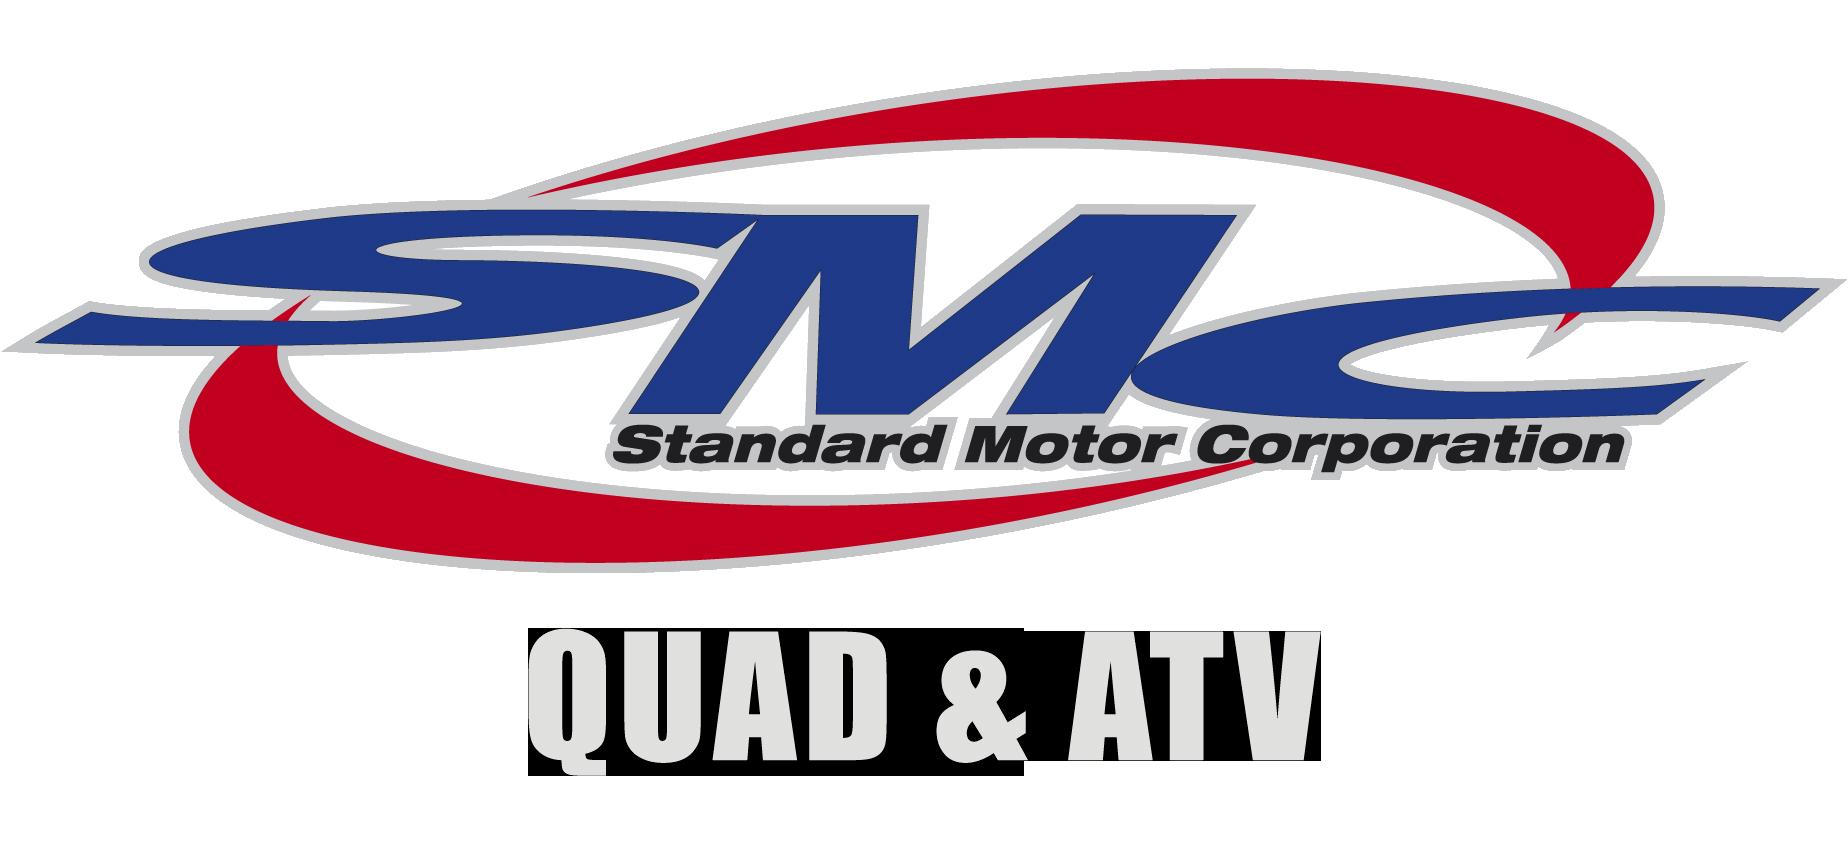 SMC QUADS & ATV von Motax GmbH Attiswil